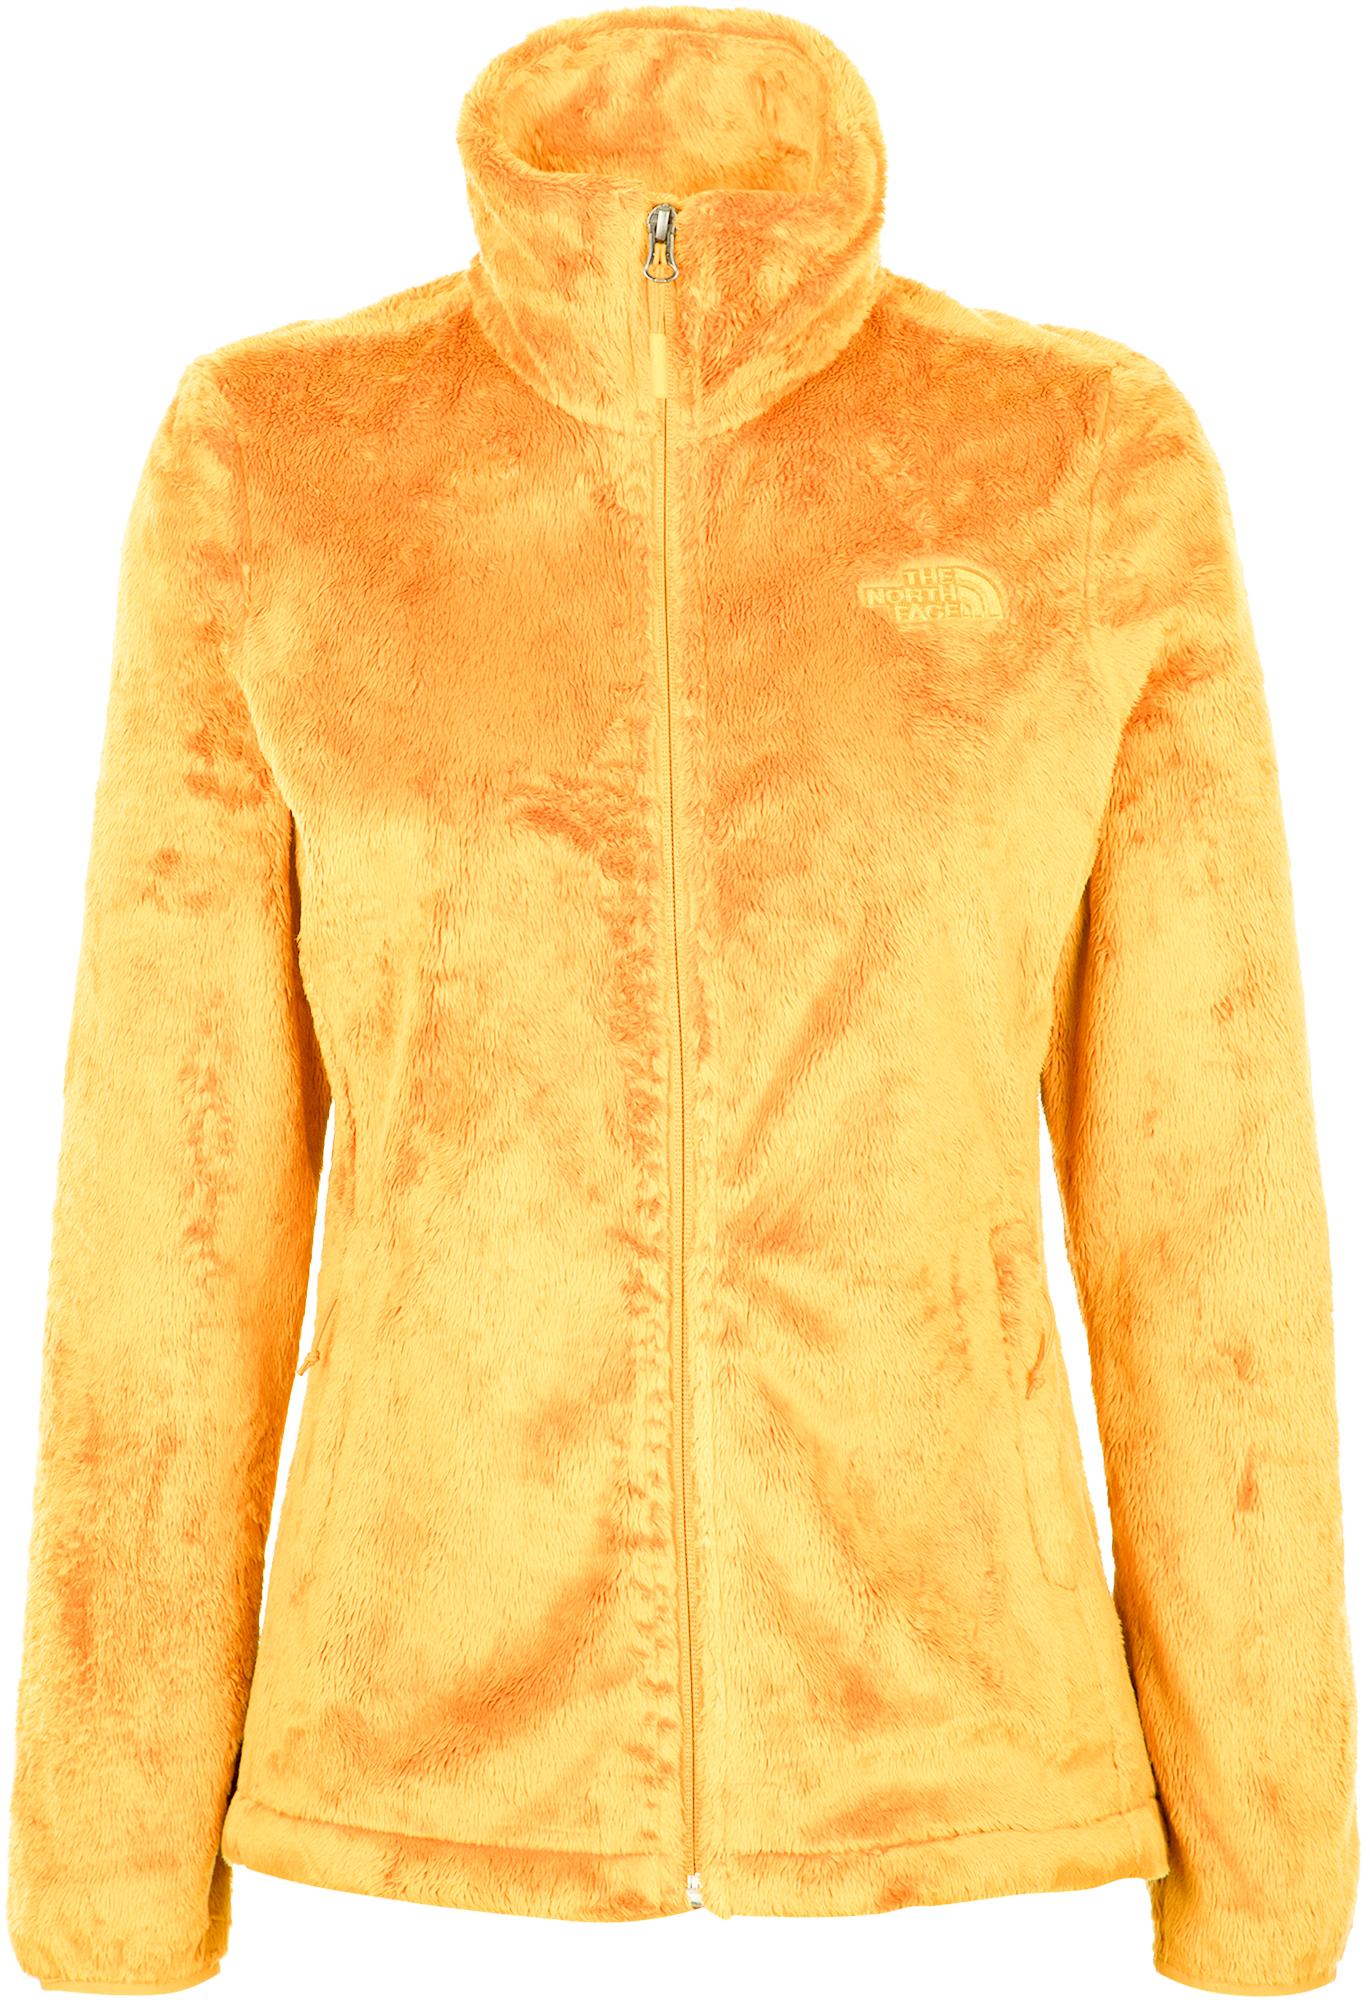 цена на The North Face Джемпер флисовый женский The North Face Osito, размер 44